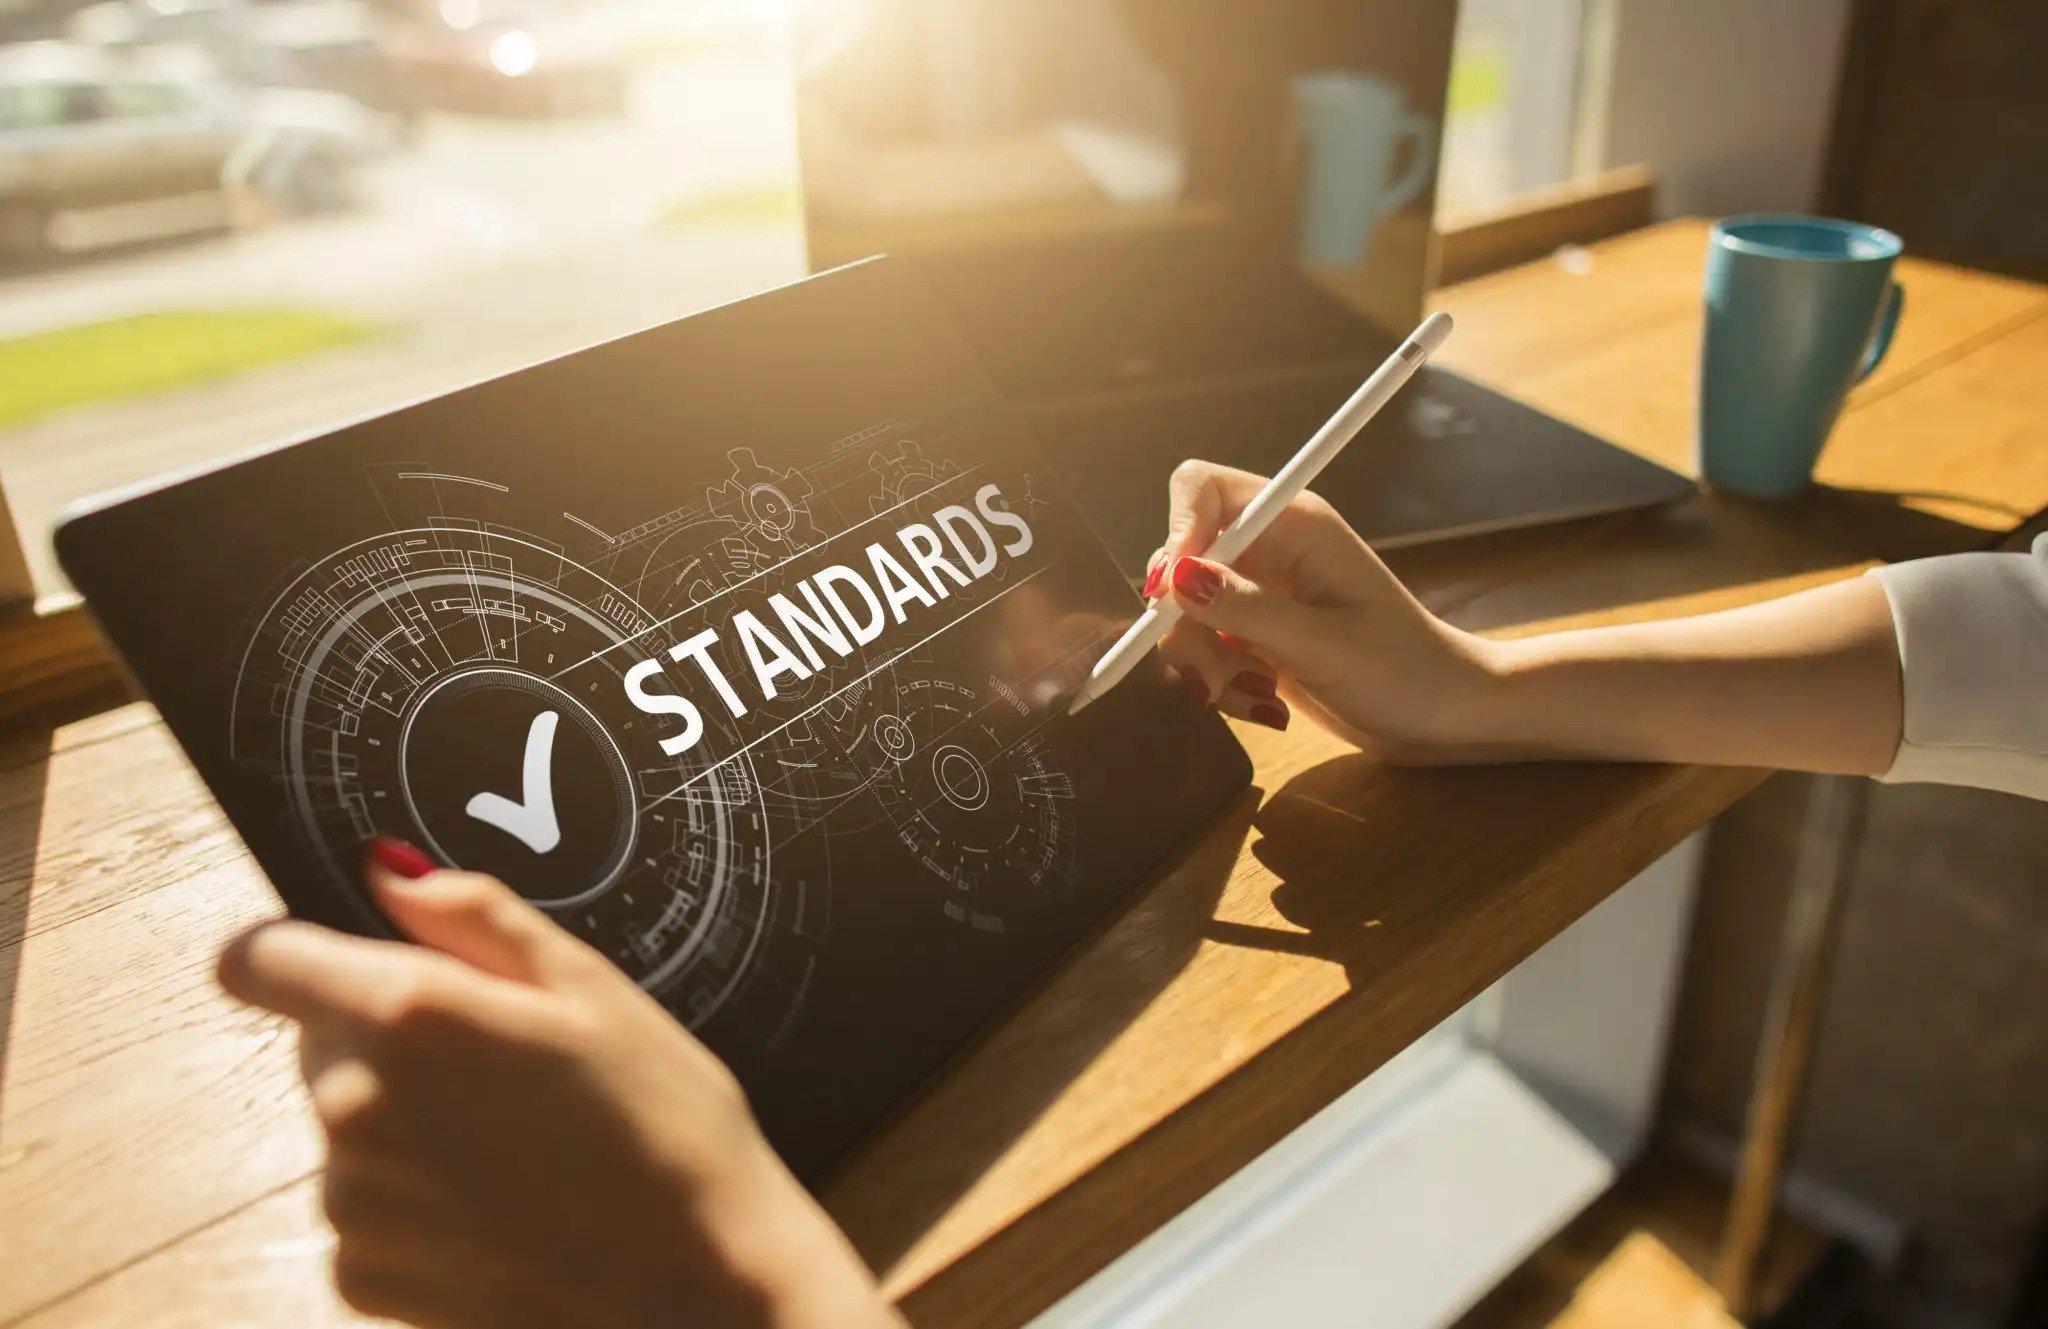 Data center monitoring industry standards